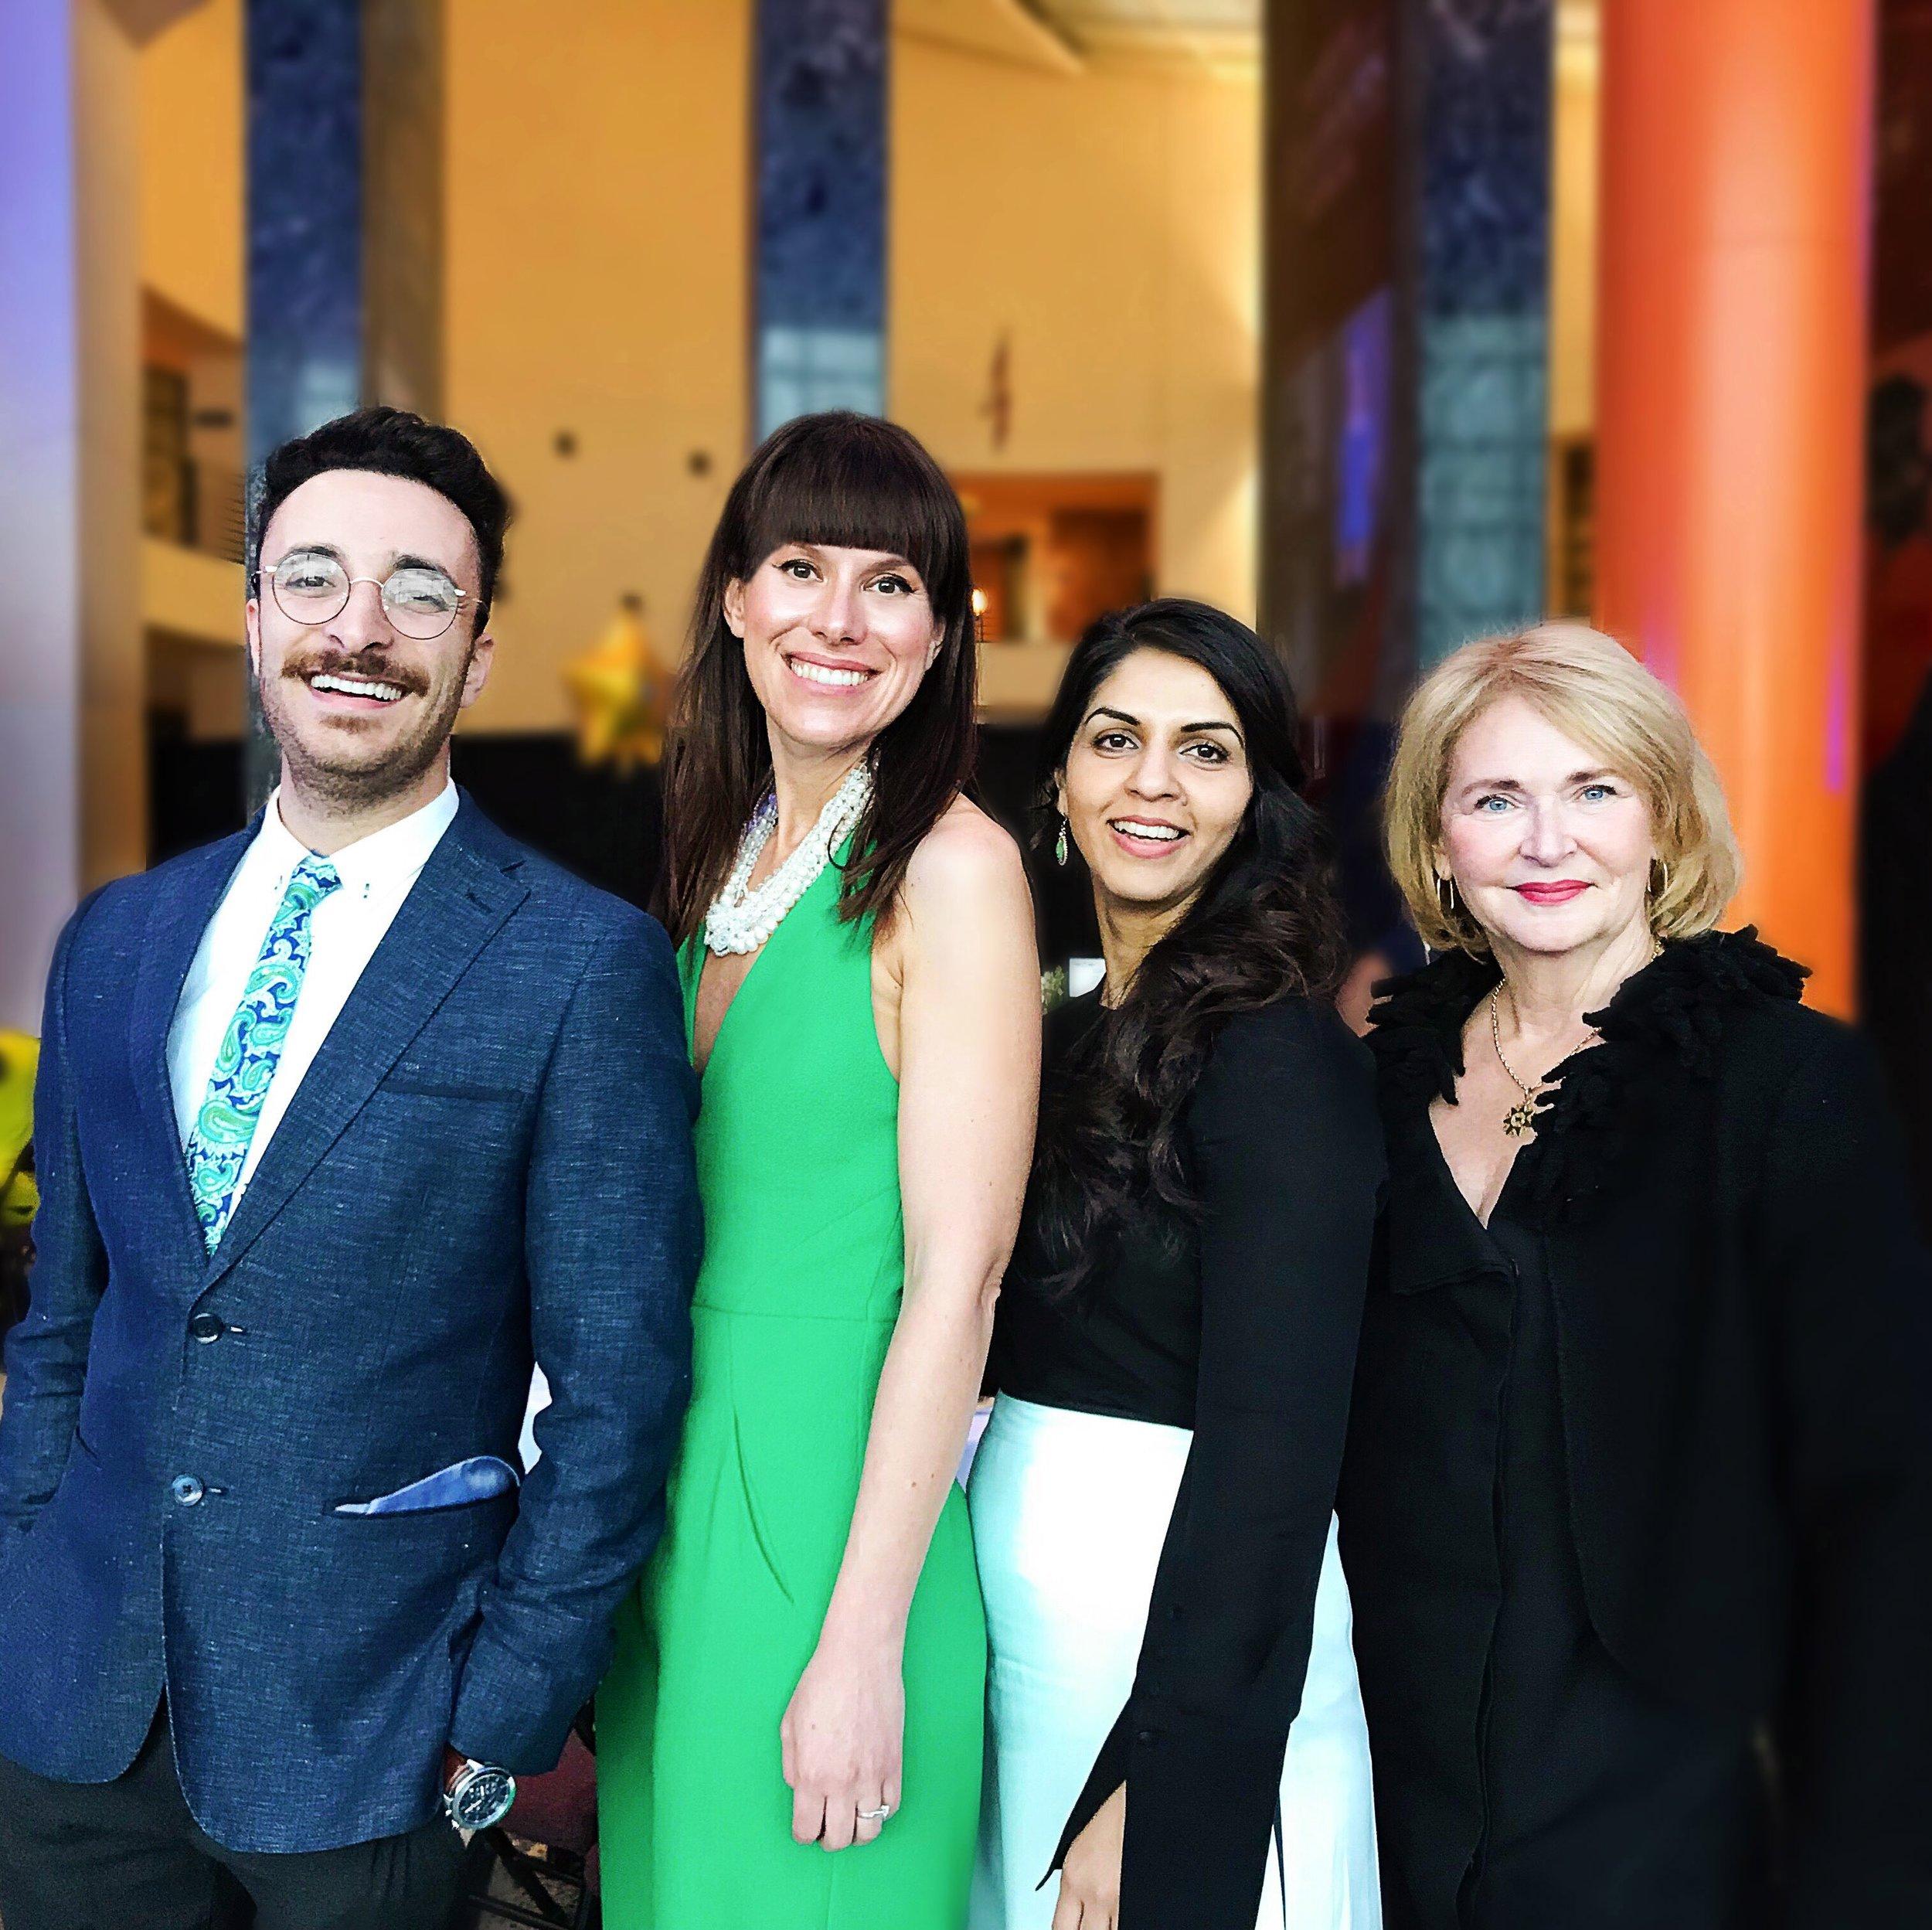 Volunteer Oscars April 2019, Ottawa